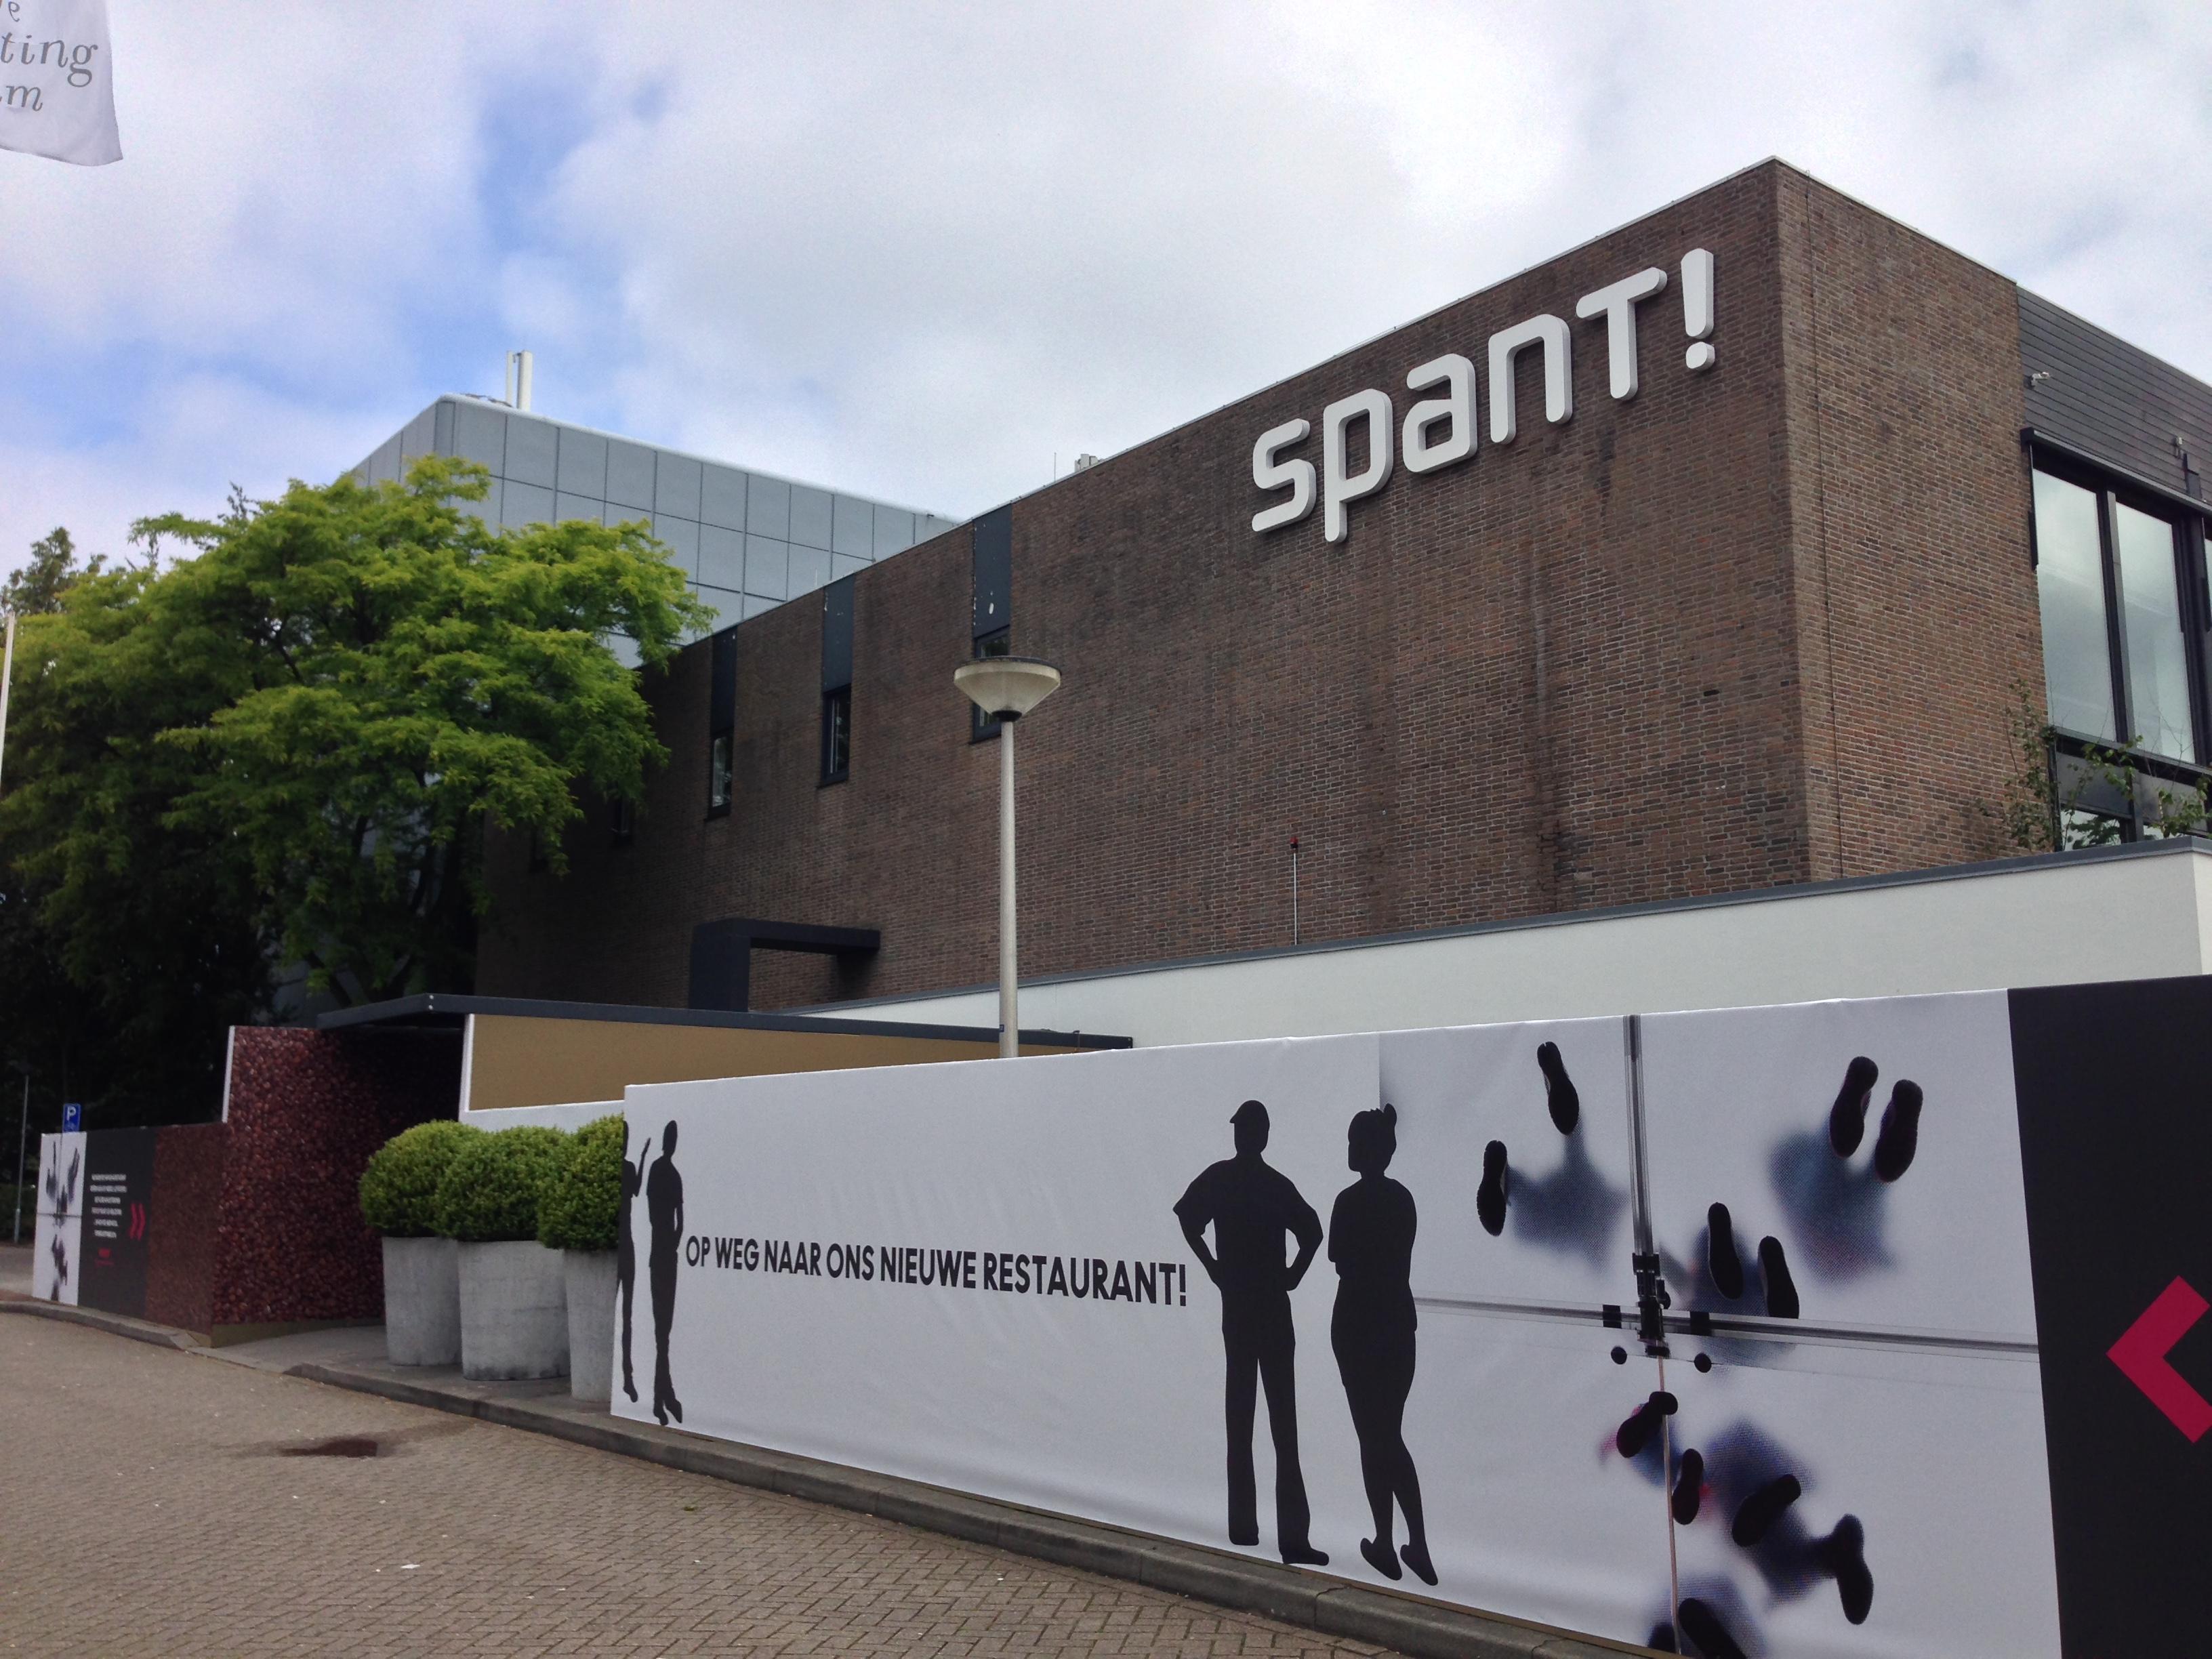 Wand Buitenkant Spant